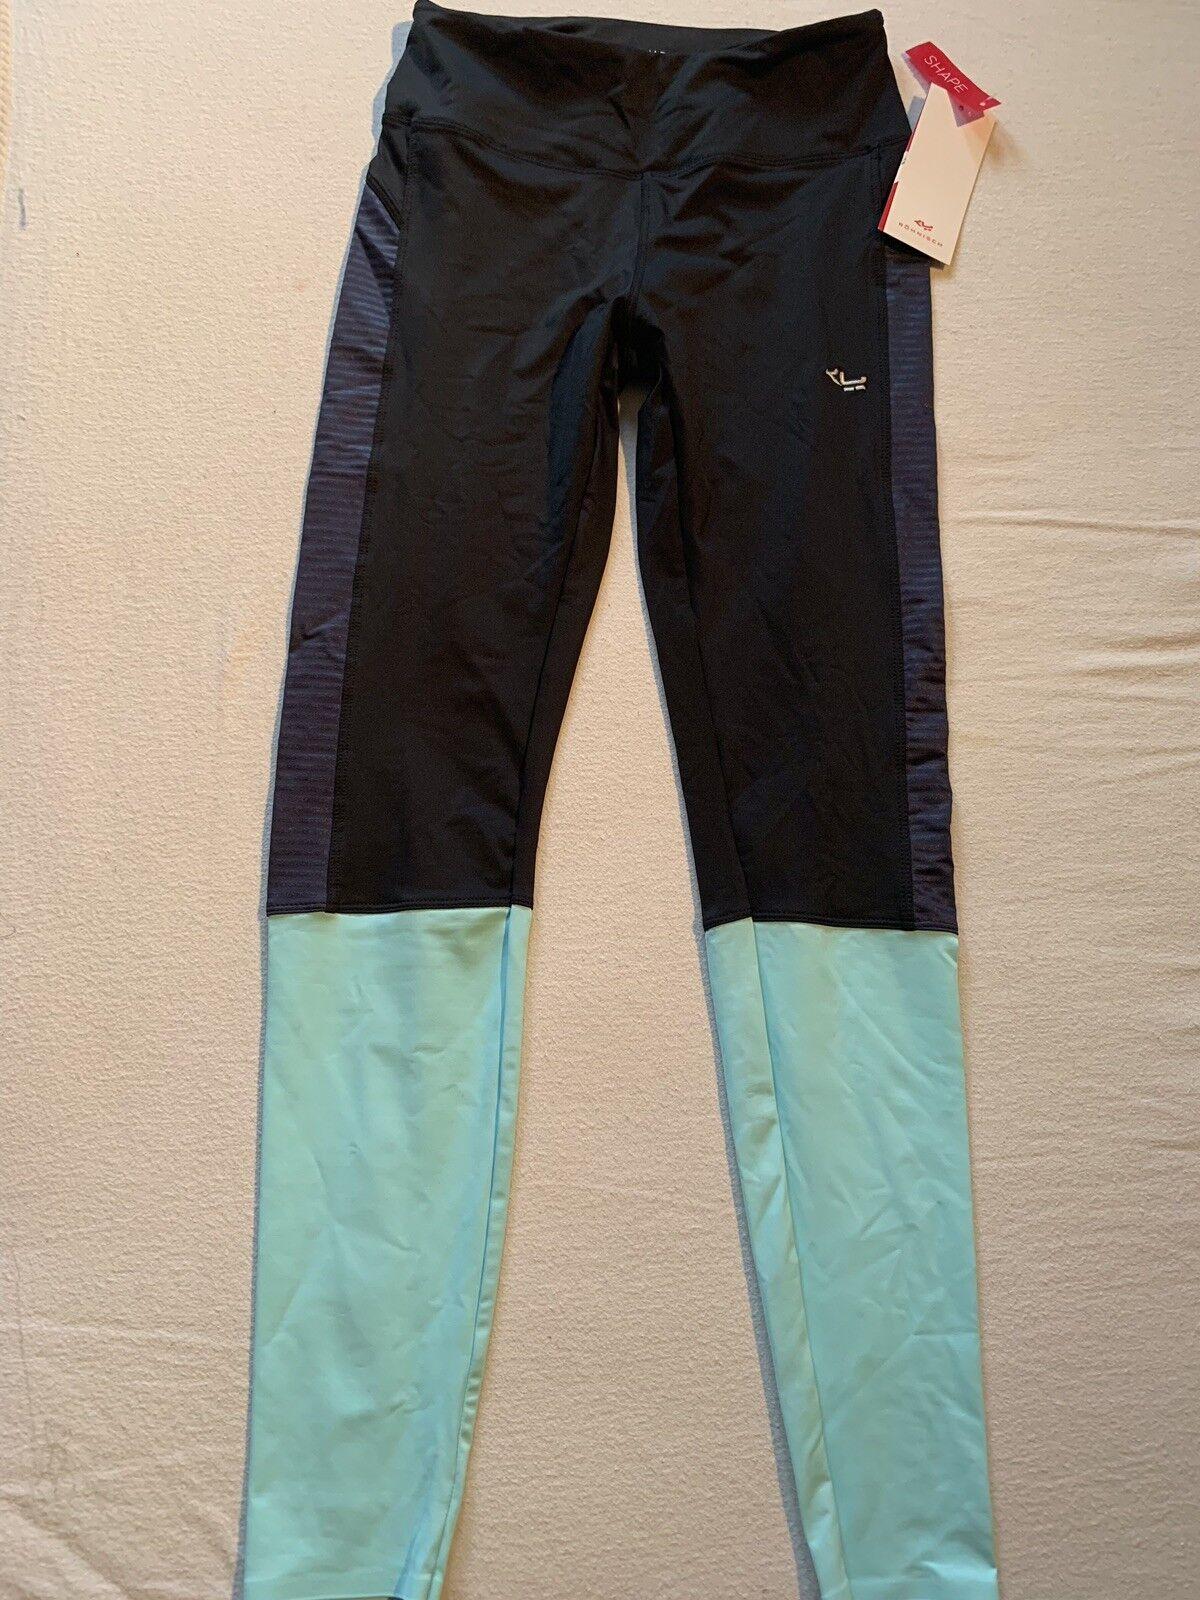 Sloggi Touch It Trend H Shorts Black Sloggi Womens Underwear No VPL 10152646